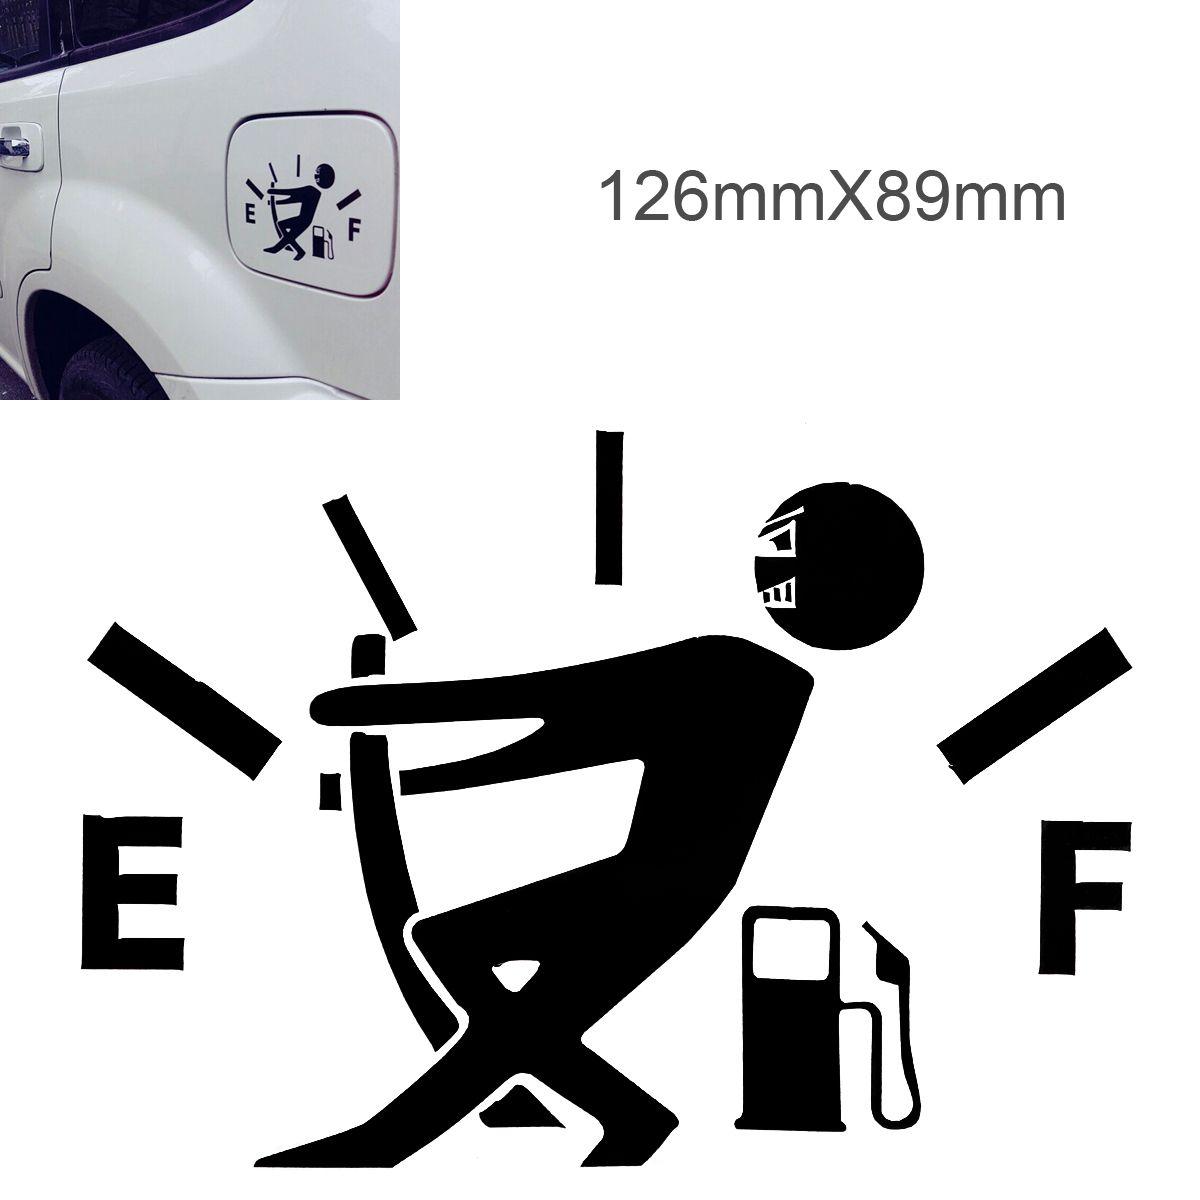 Funny Car Stickers 12 7 X 9 2cm Waterproof Gas Empty